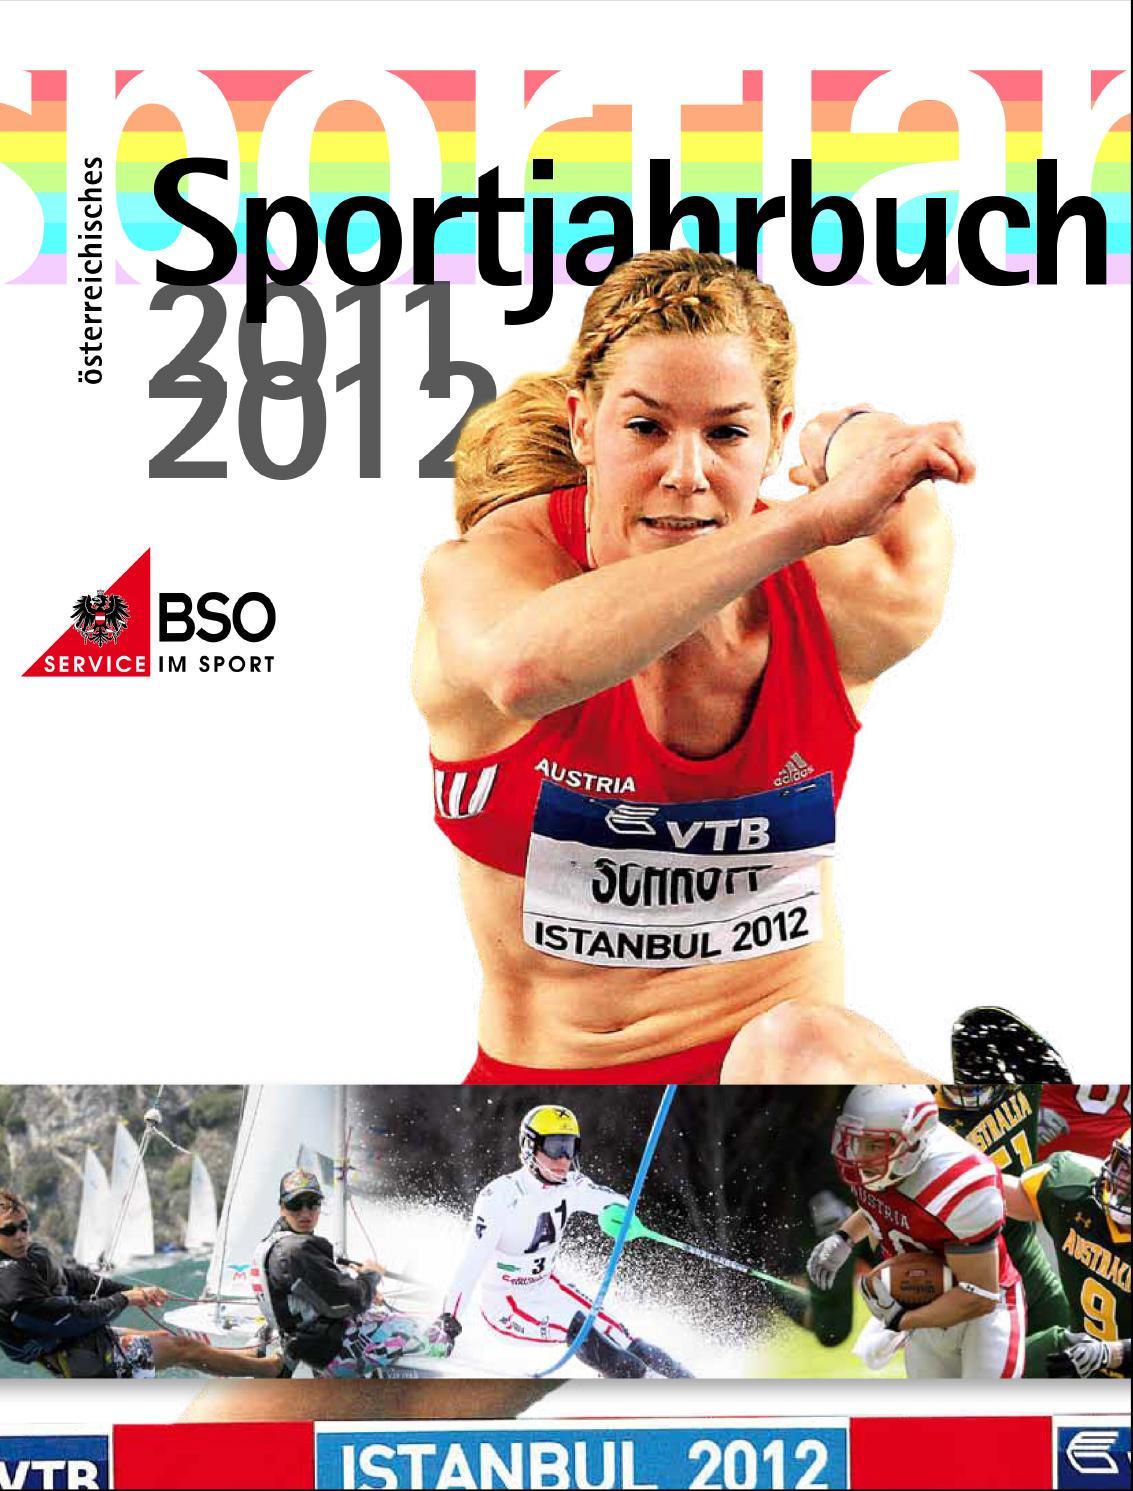 BSO-Sportjahrbuch 2011/12 by Bundes-Sportorganisation - issuu